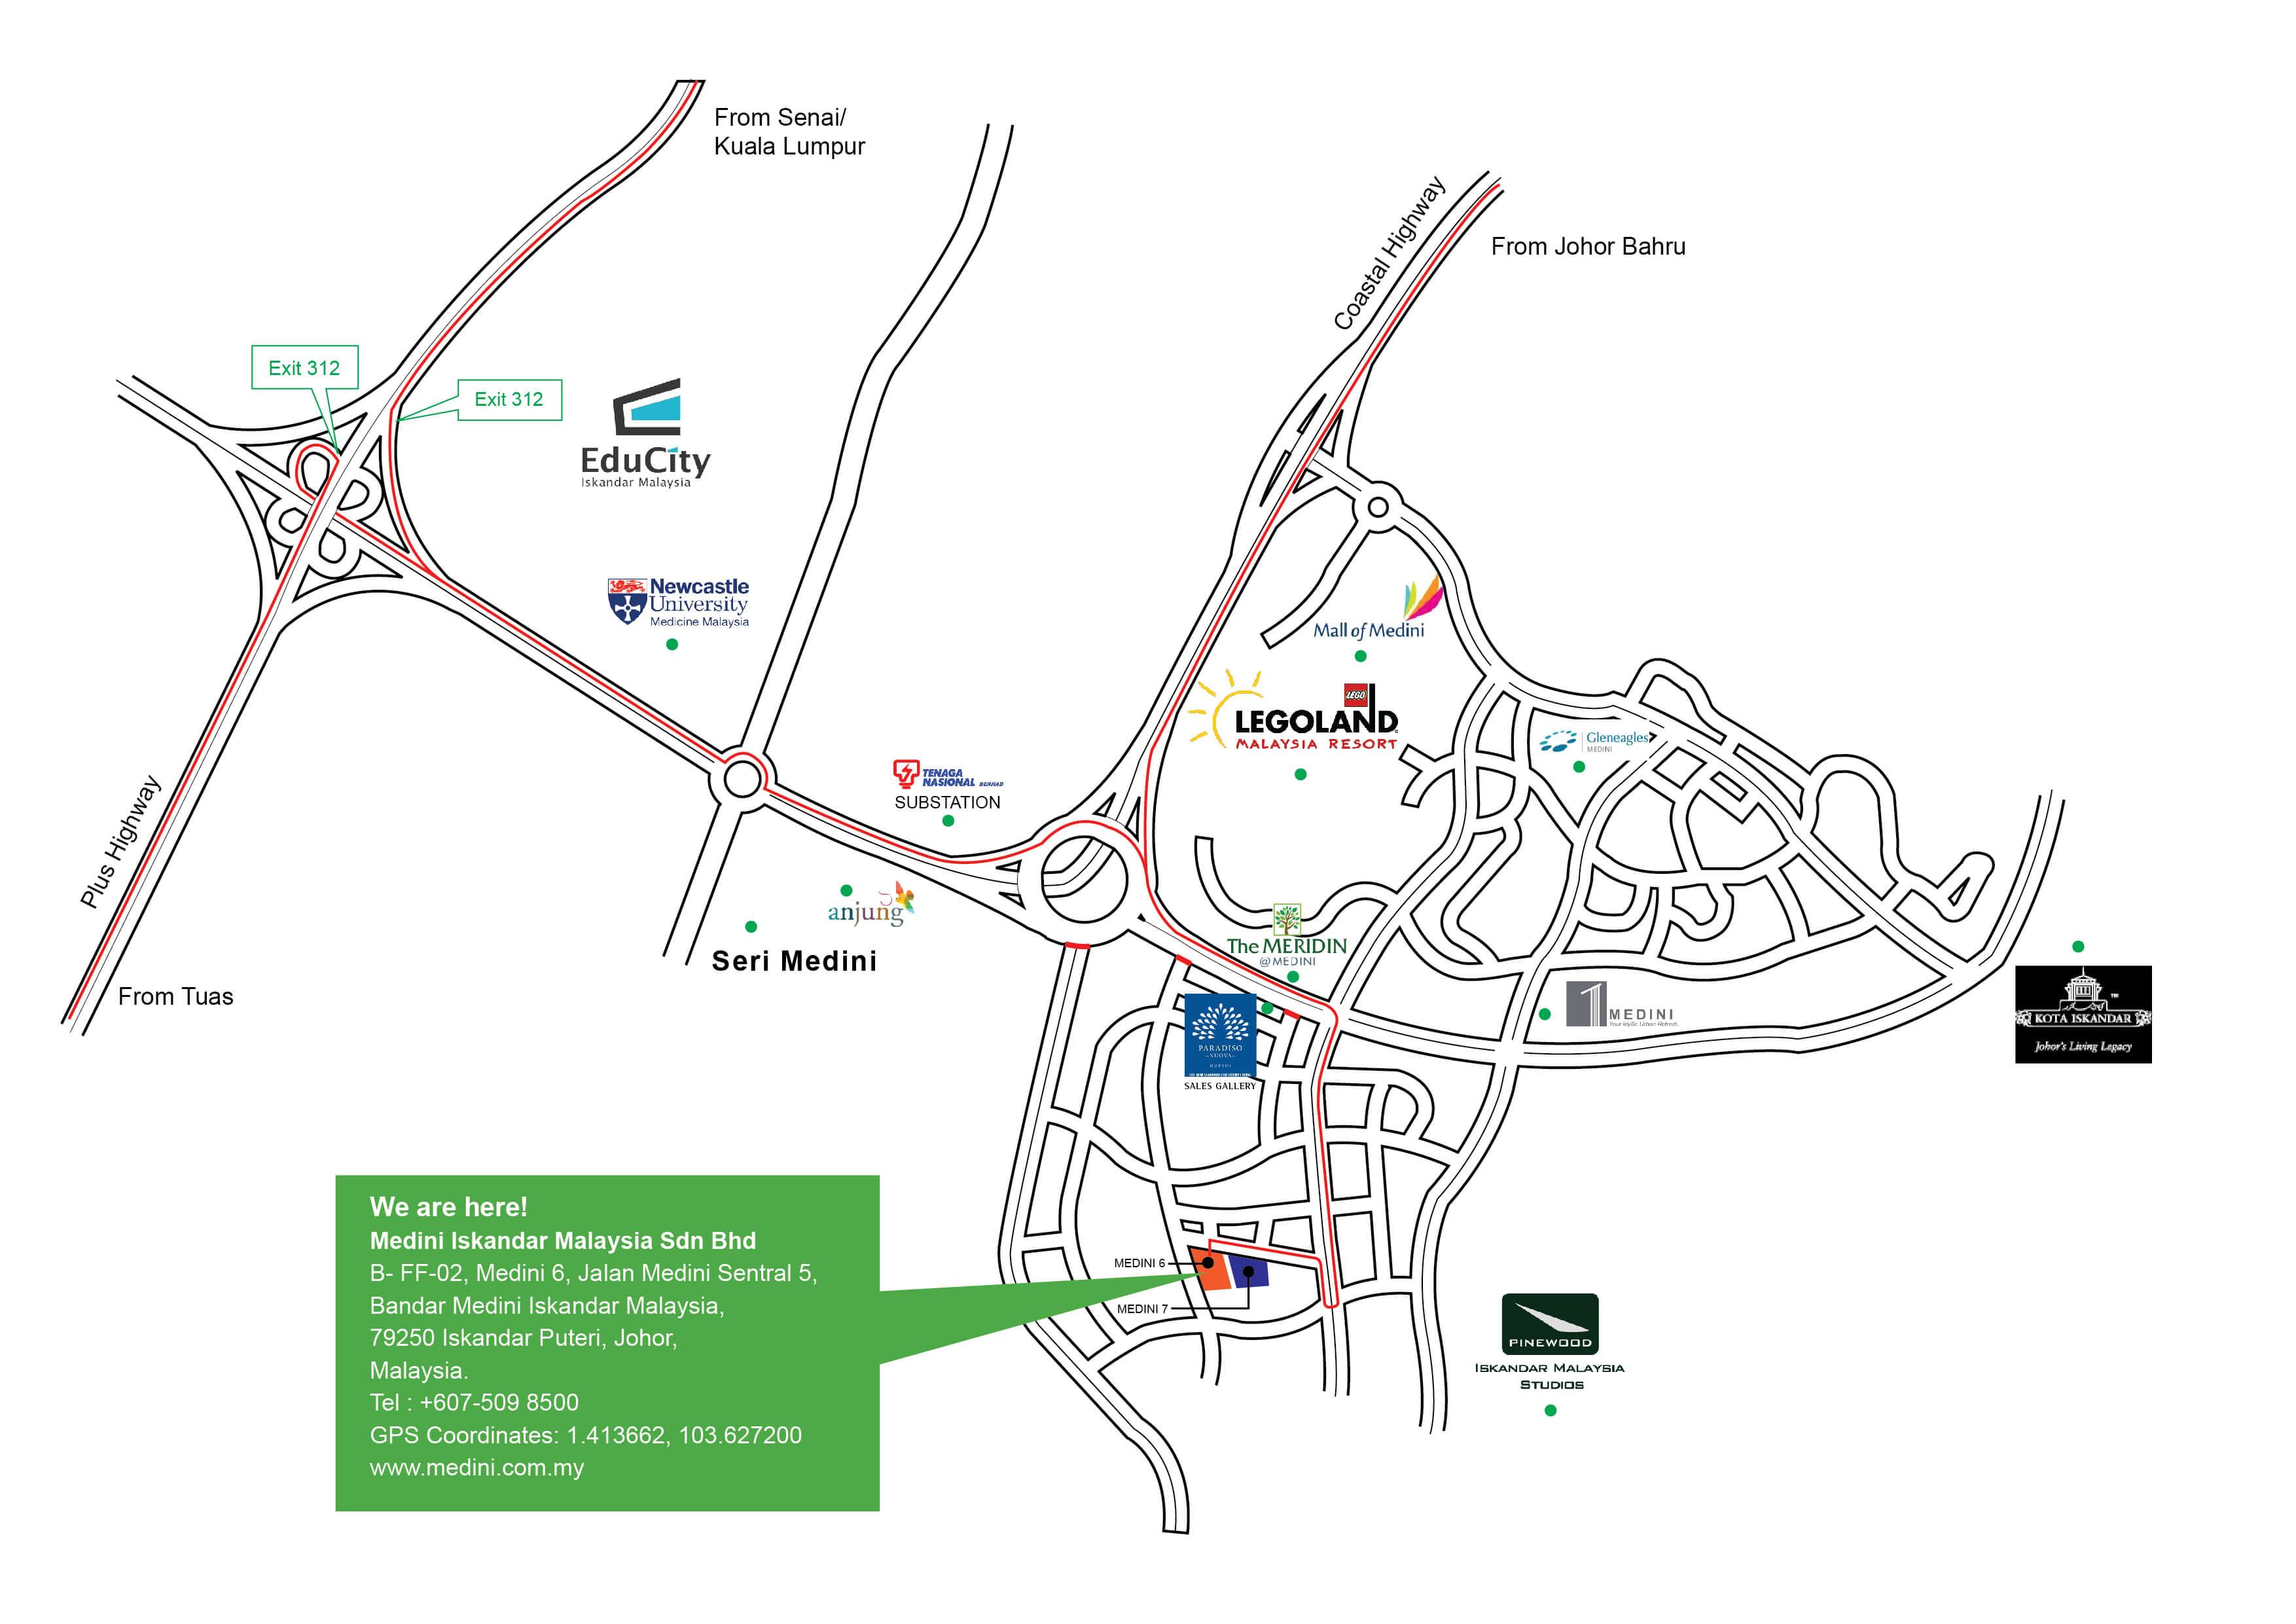 Medini iskandar malaysia view map malvernweather Gallery